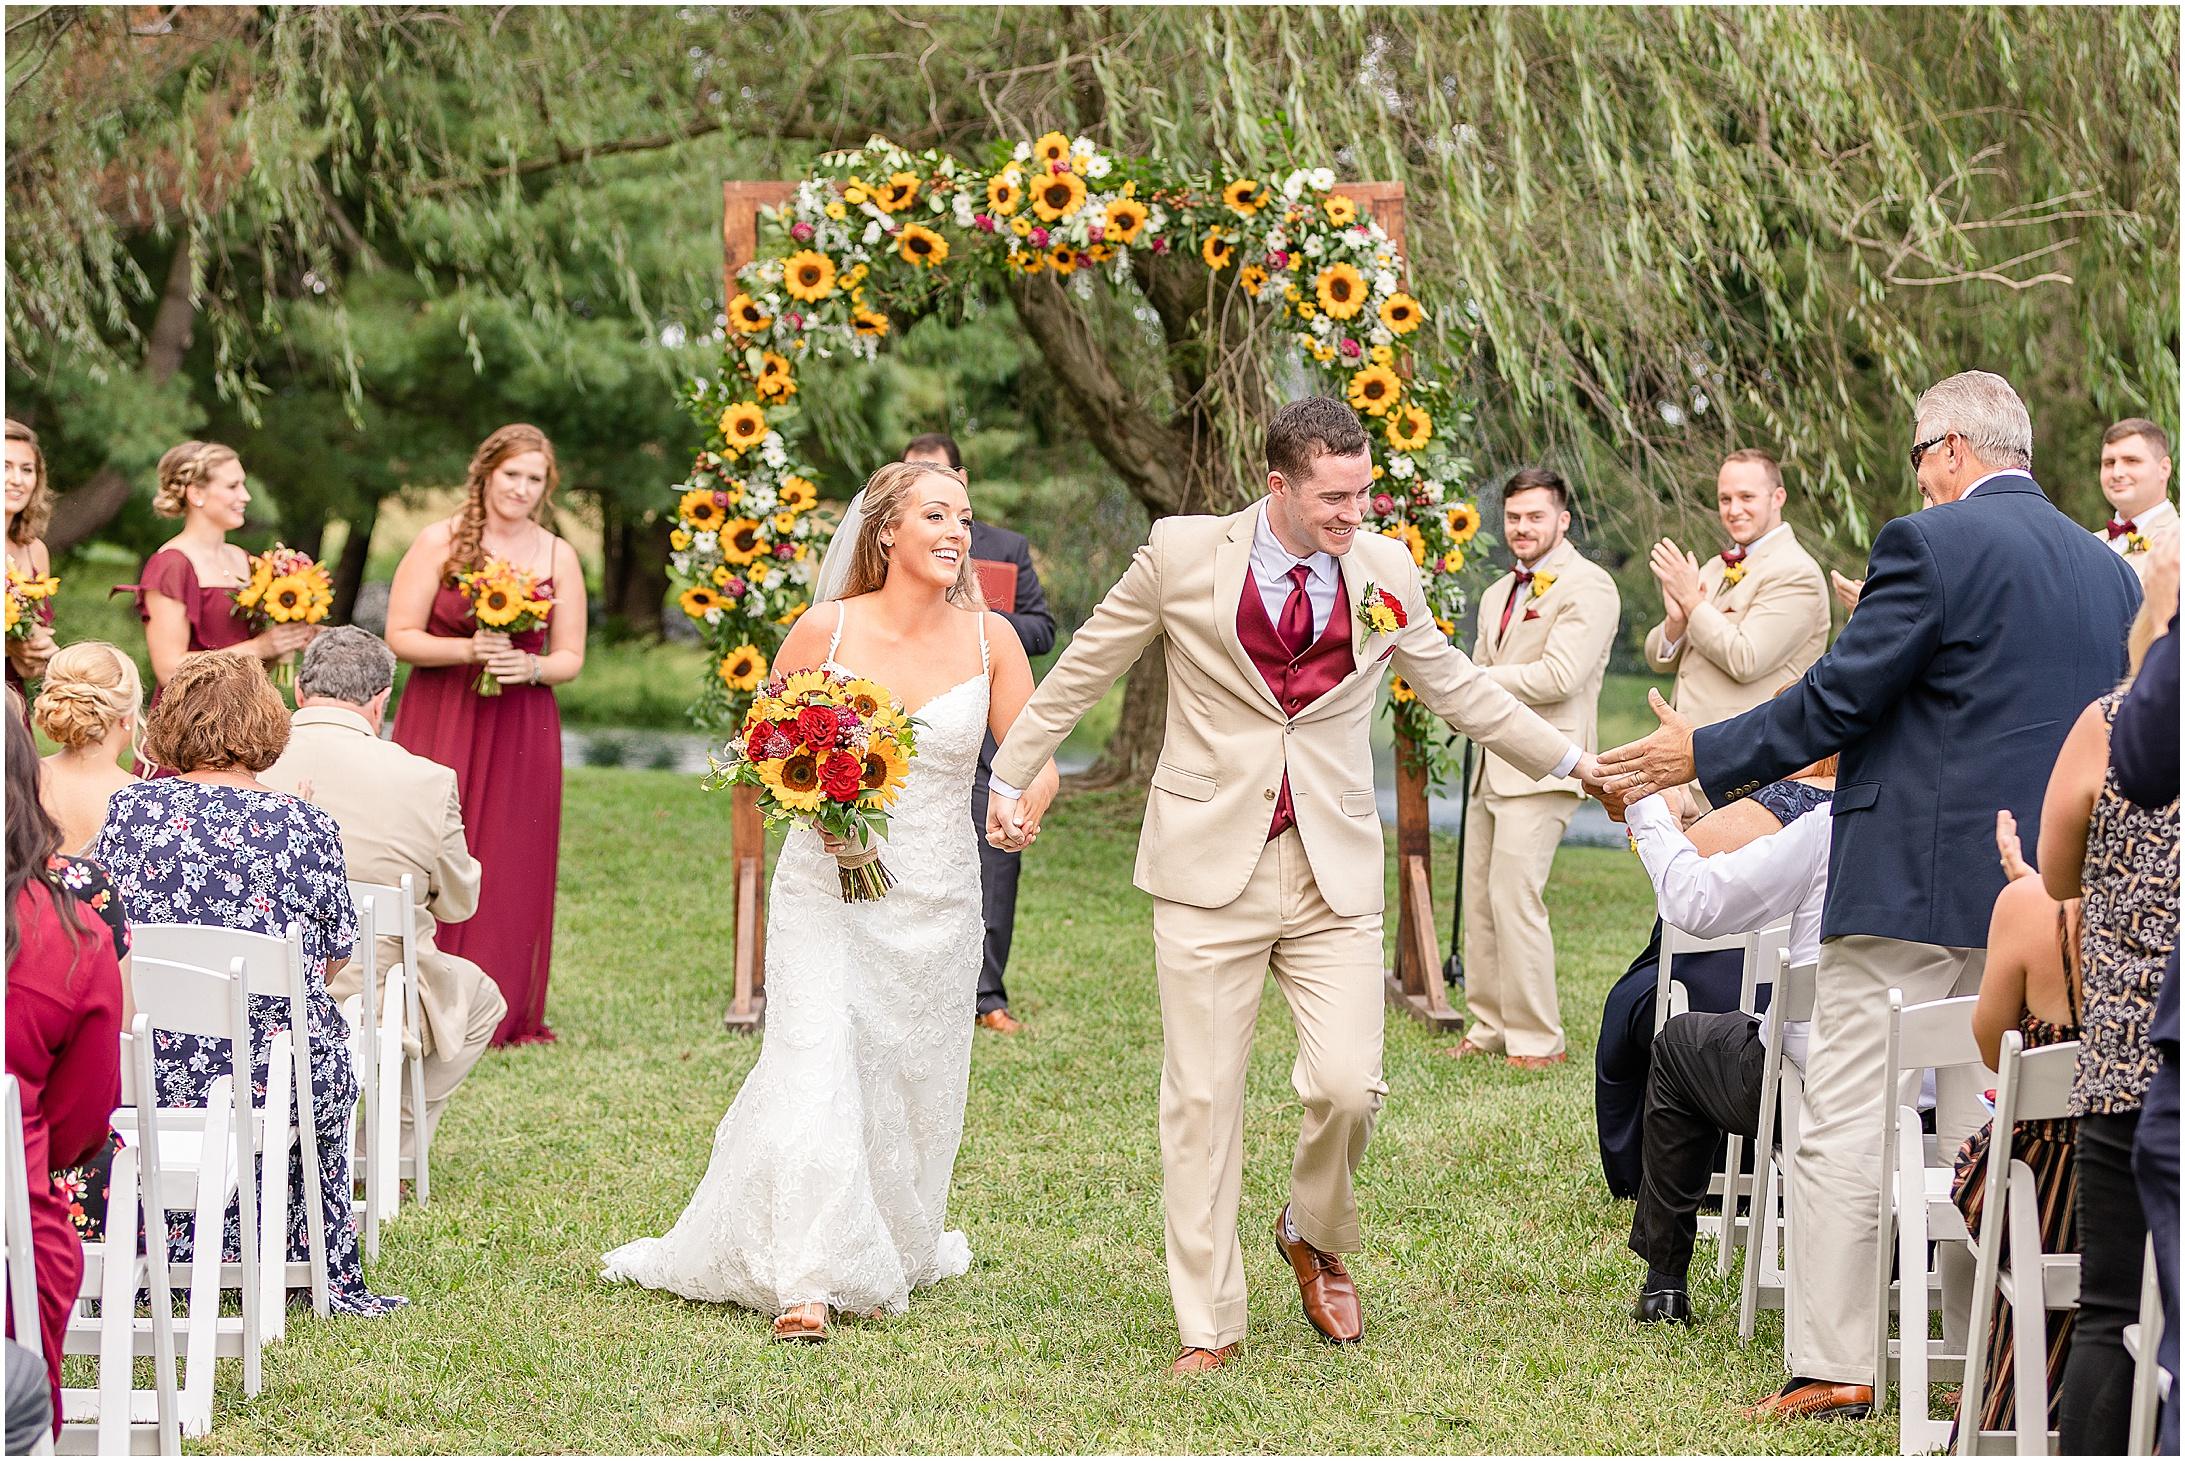 Christian-Royer-House-Wedding-Photos_0568.jpg